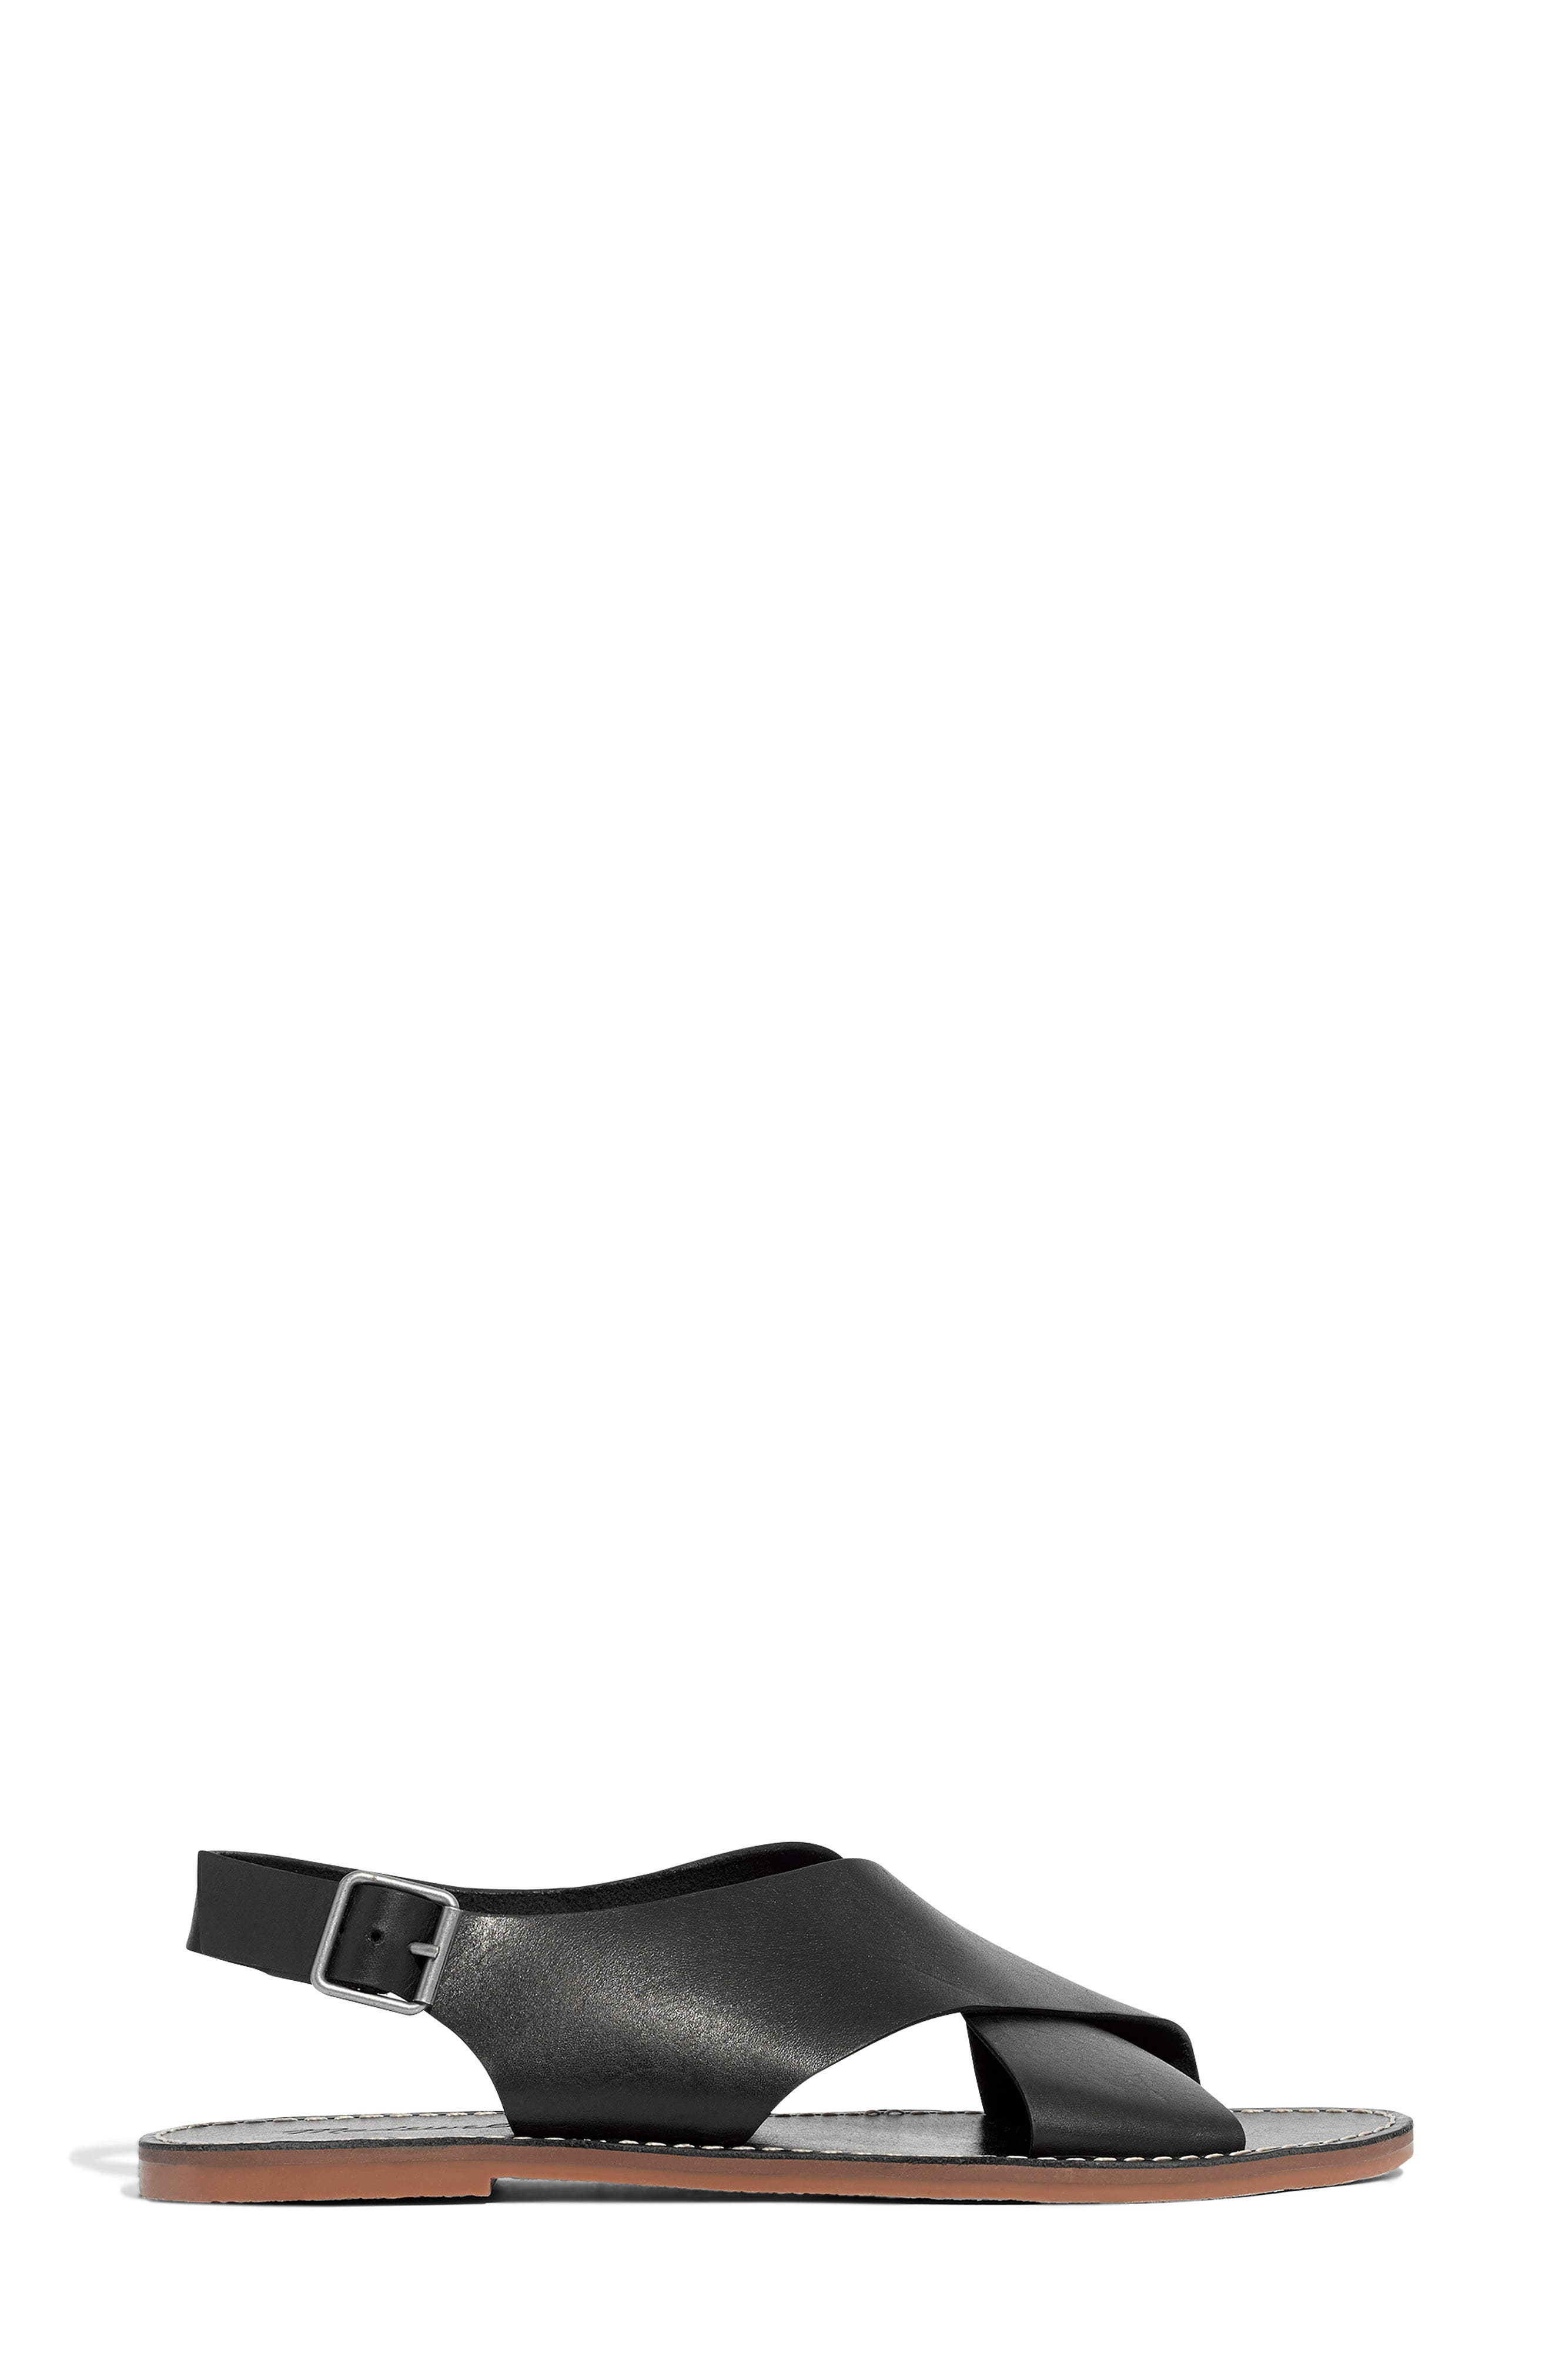 MADEWELL, Boardwalk Flat Sandal, Alternate thumbnail 3, color, TRUE BLACK